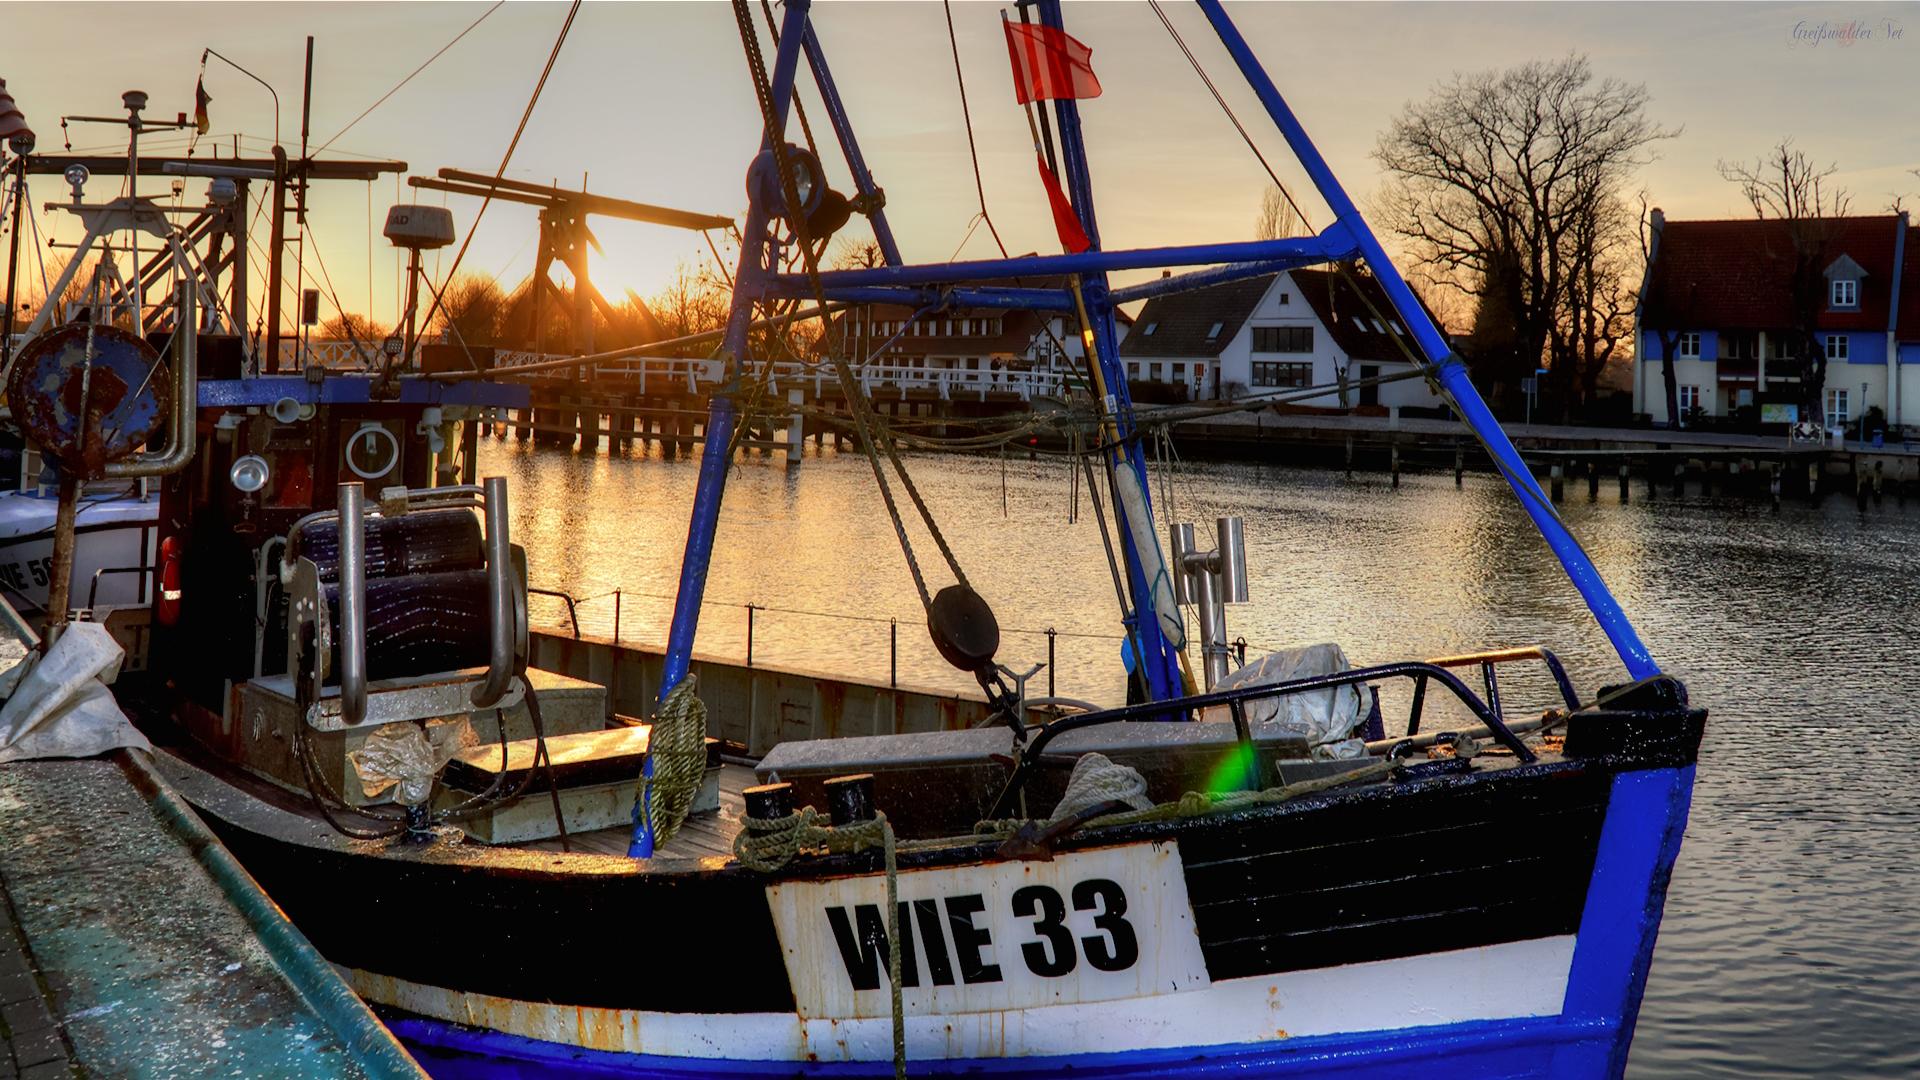 Sonnenuntergang am Hafen in Greifswald-Wieck